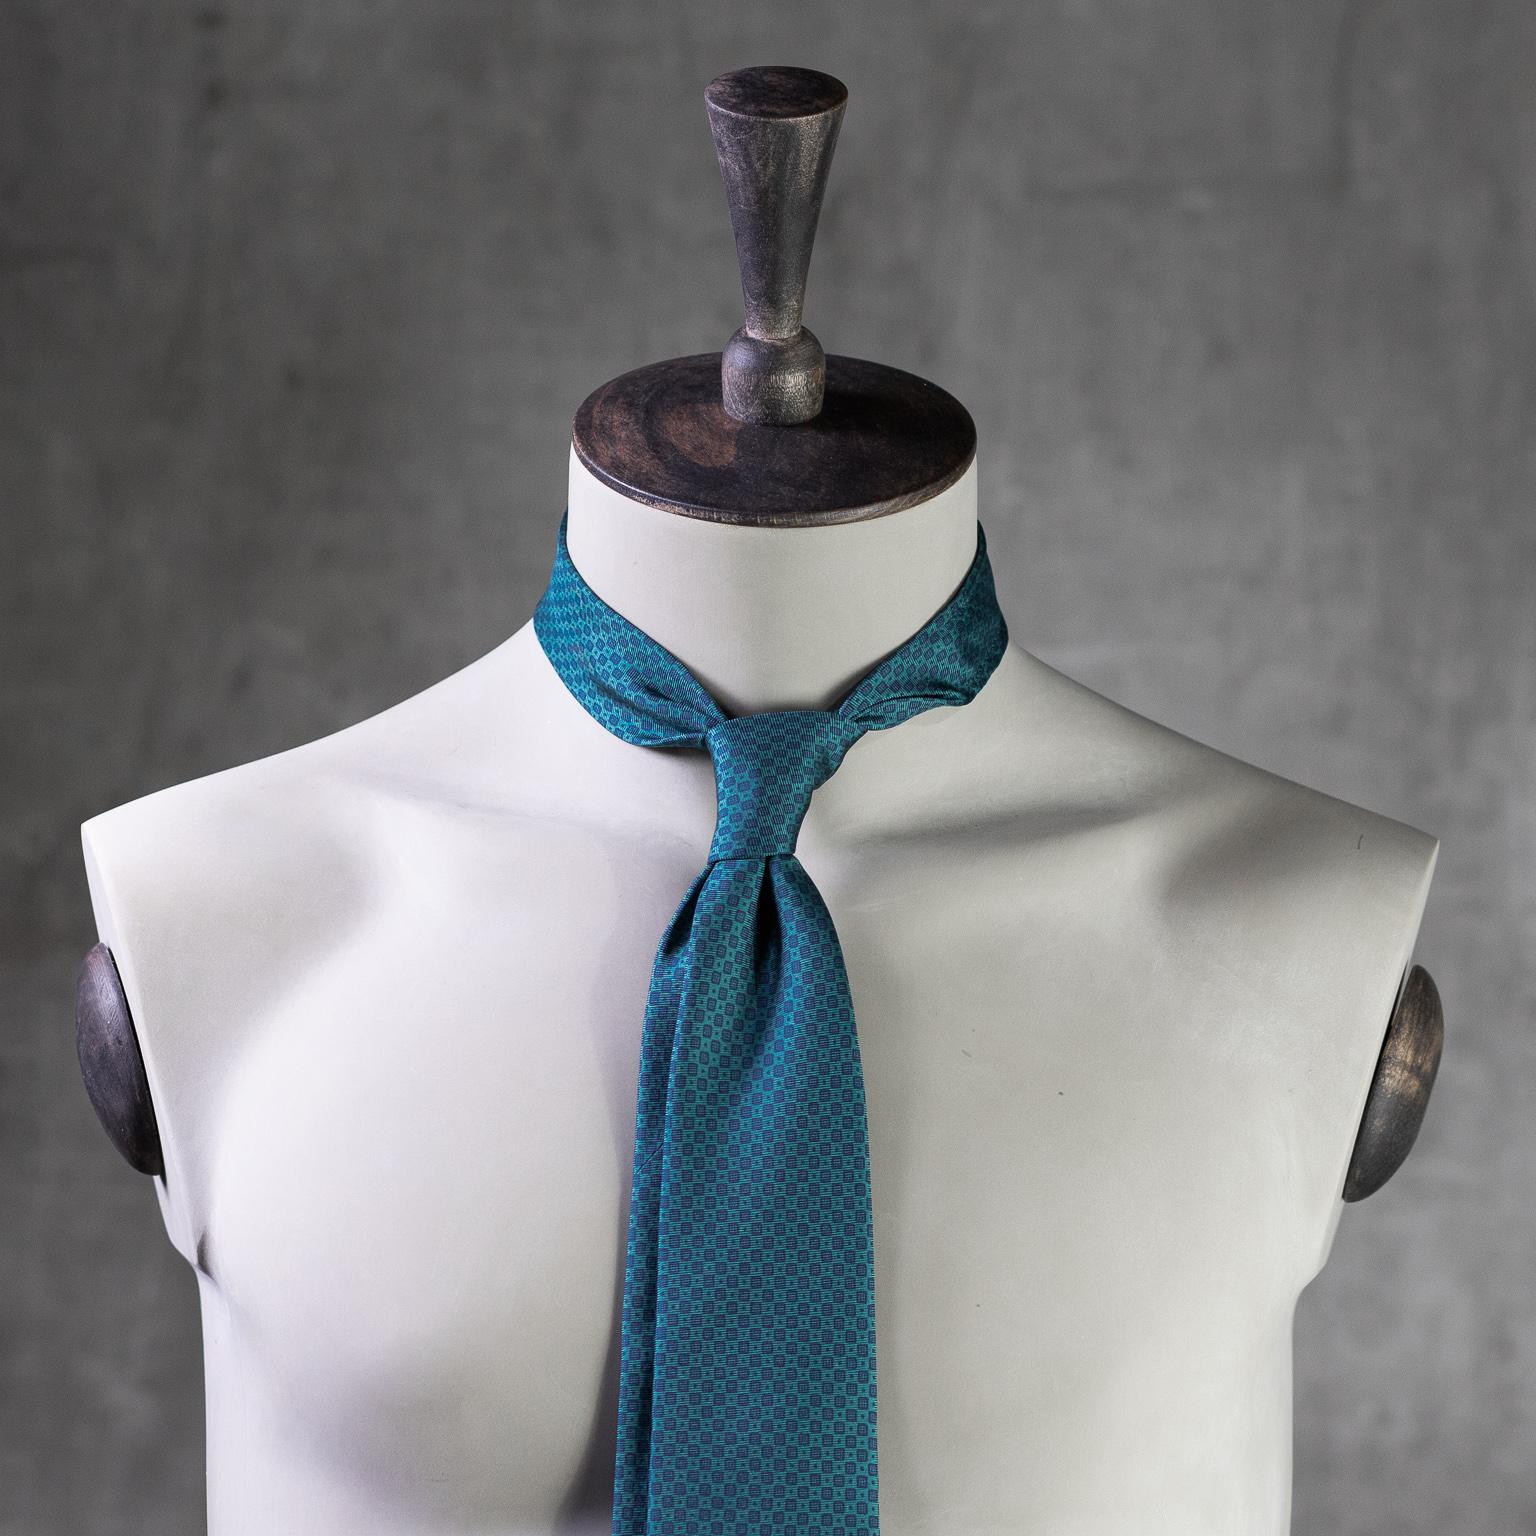 PRINTED-SILK-SEDA-ESTAMPADA-0571-Tie-Initials-Corbata-Iniciales-The-Seëlk-2